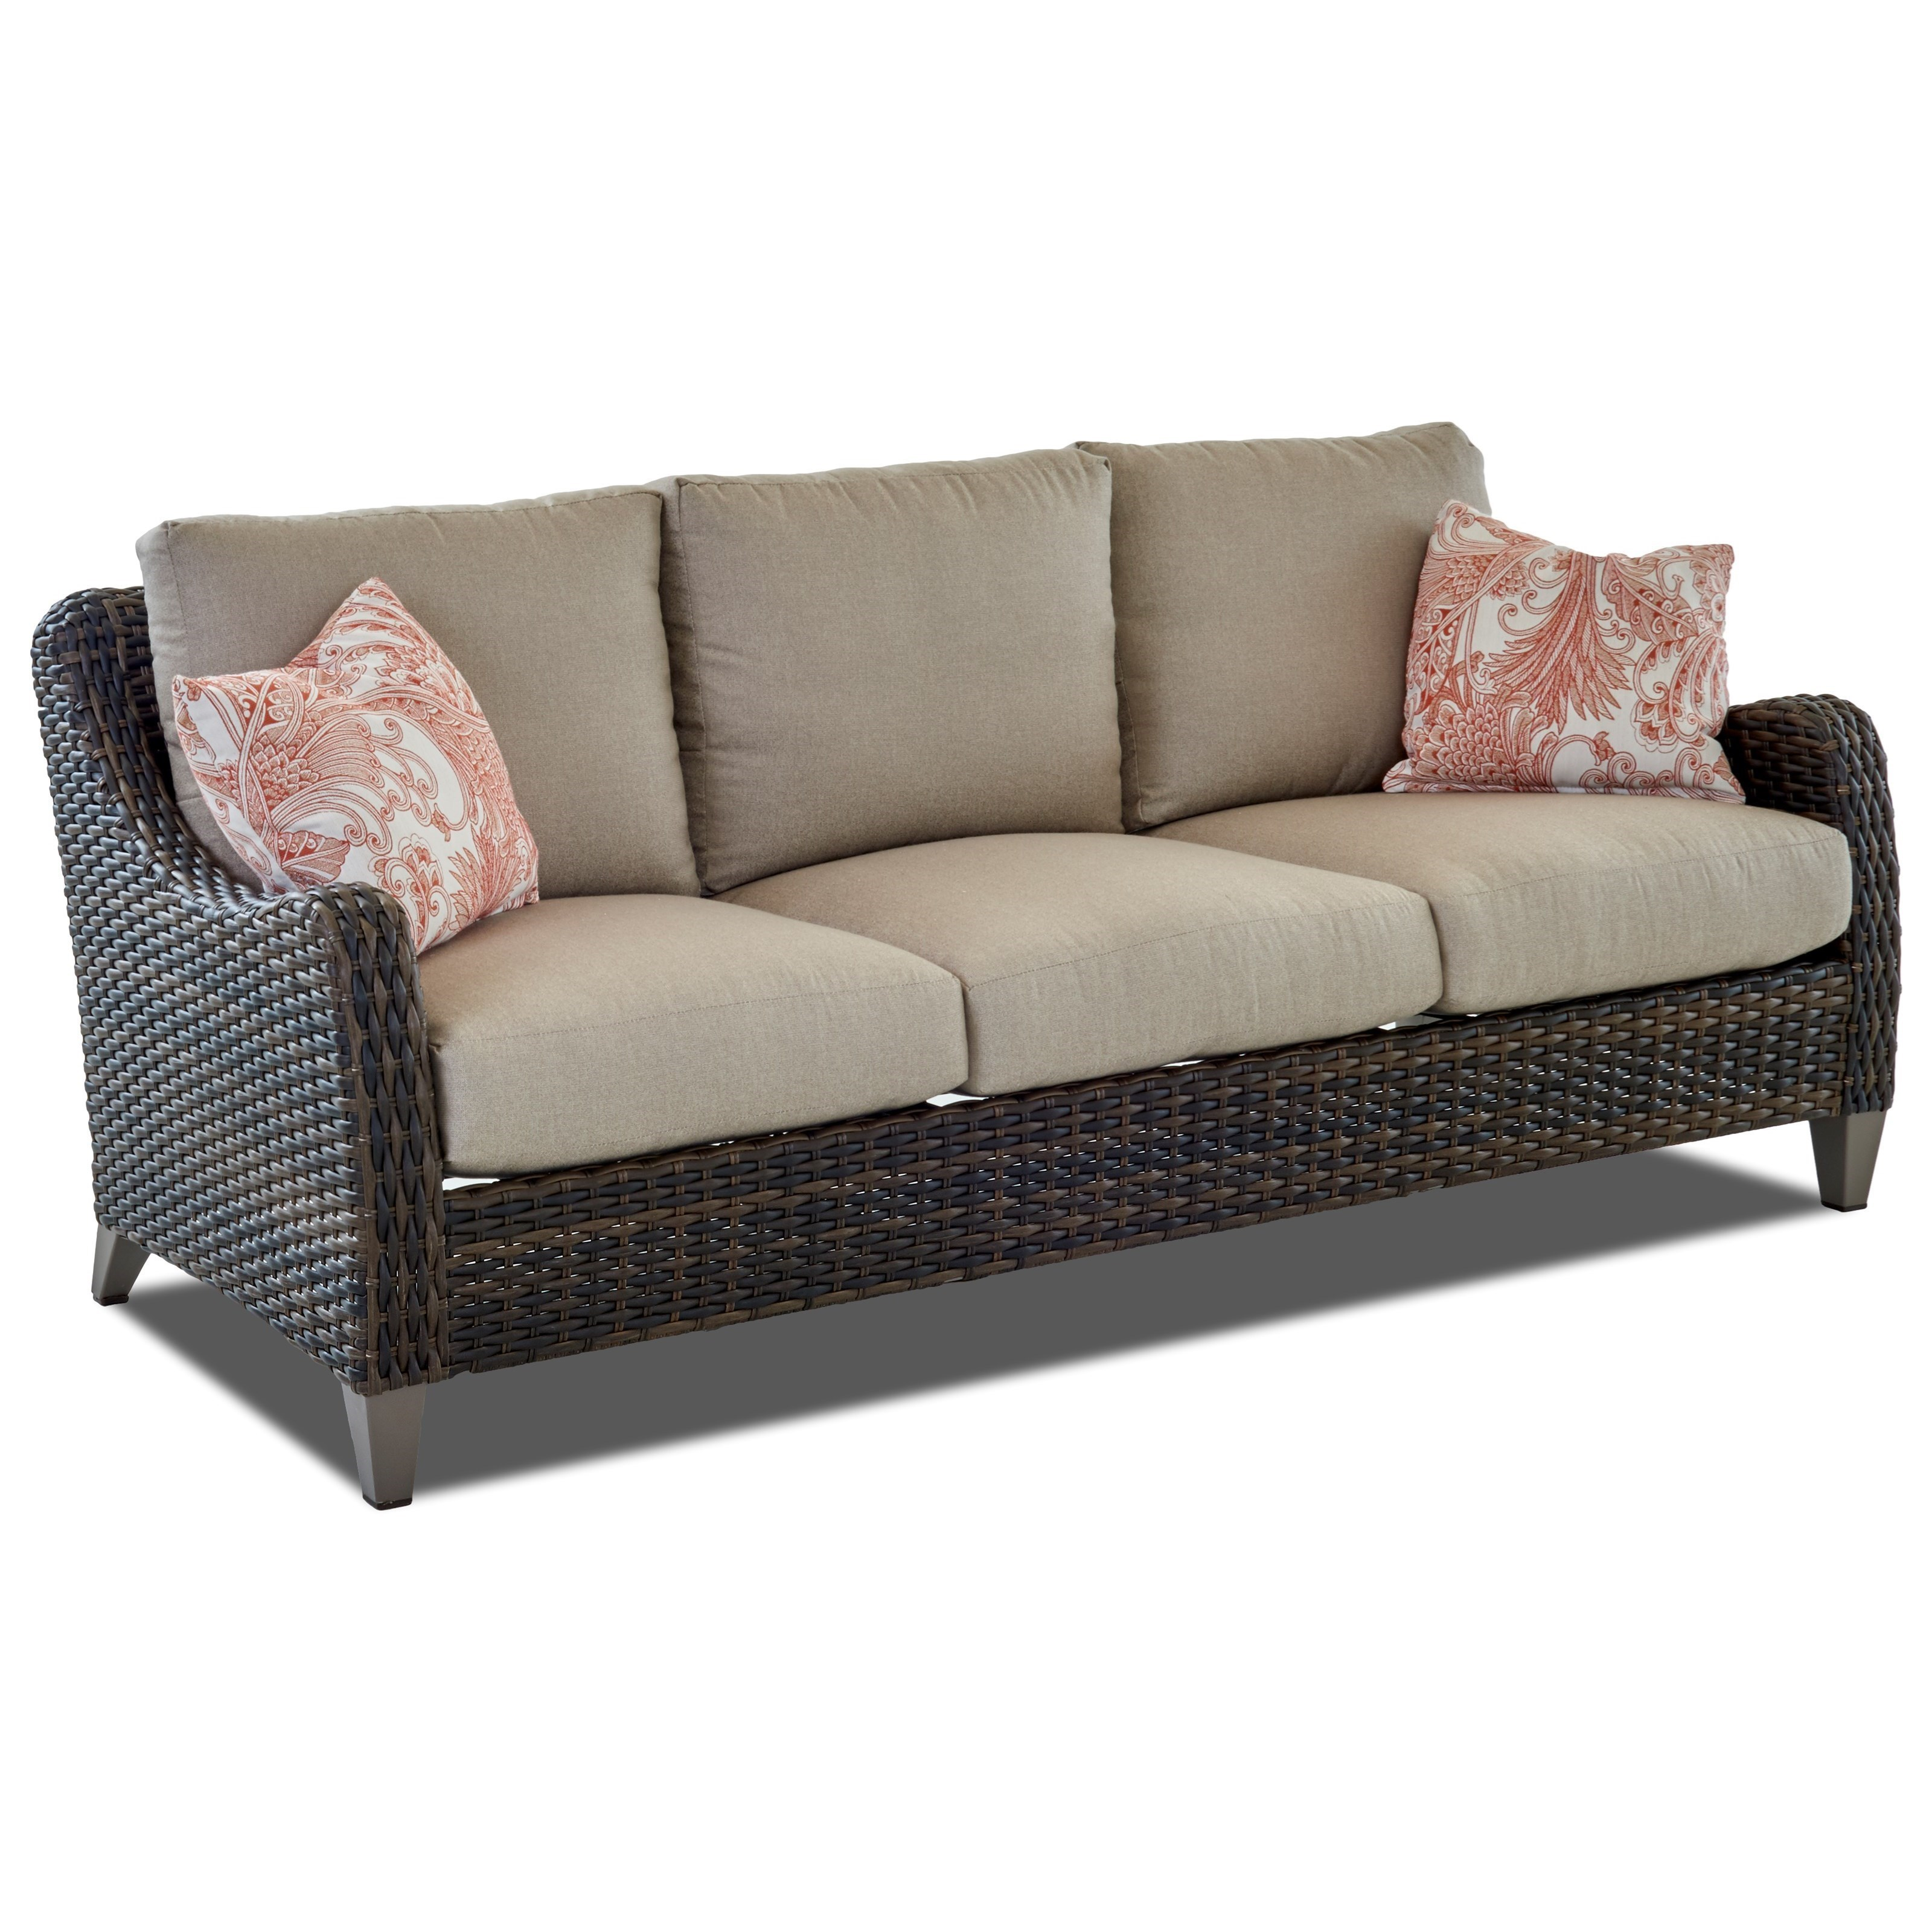 Metropia Outdoor TulsaSofa With Drainable Cushion ...